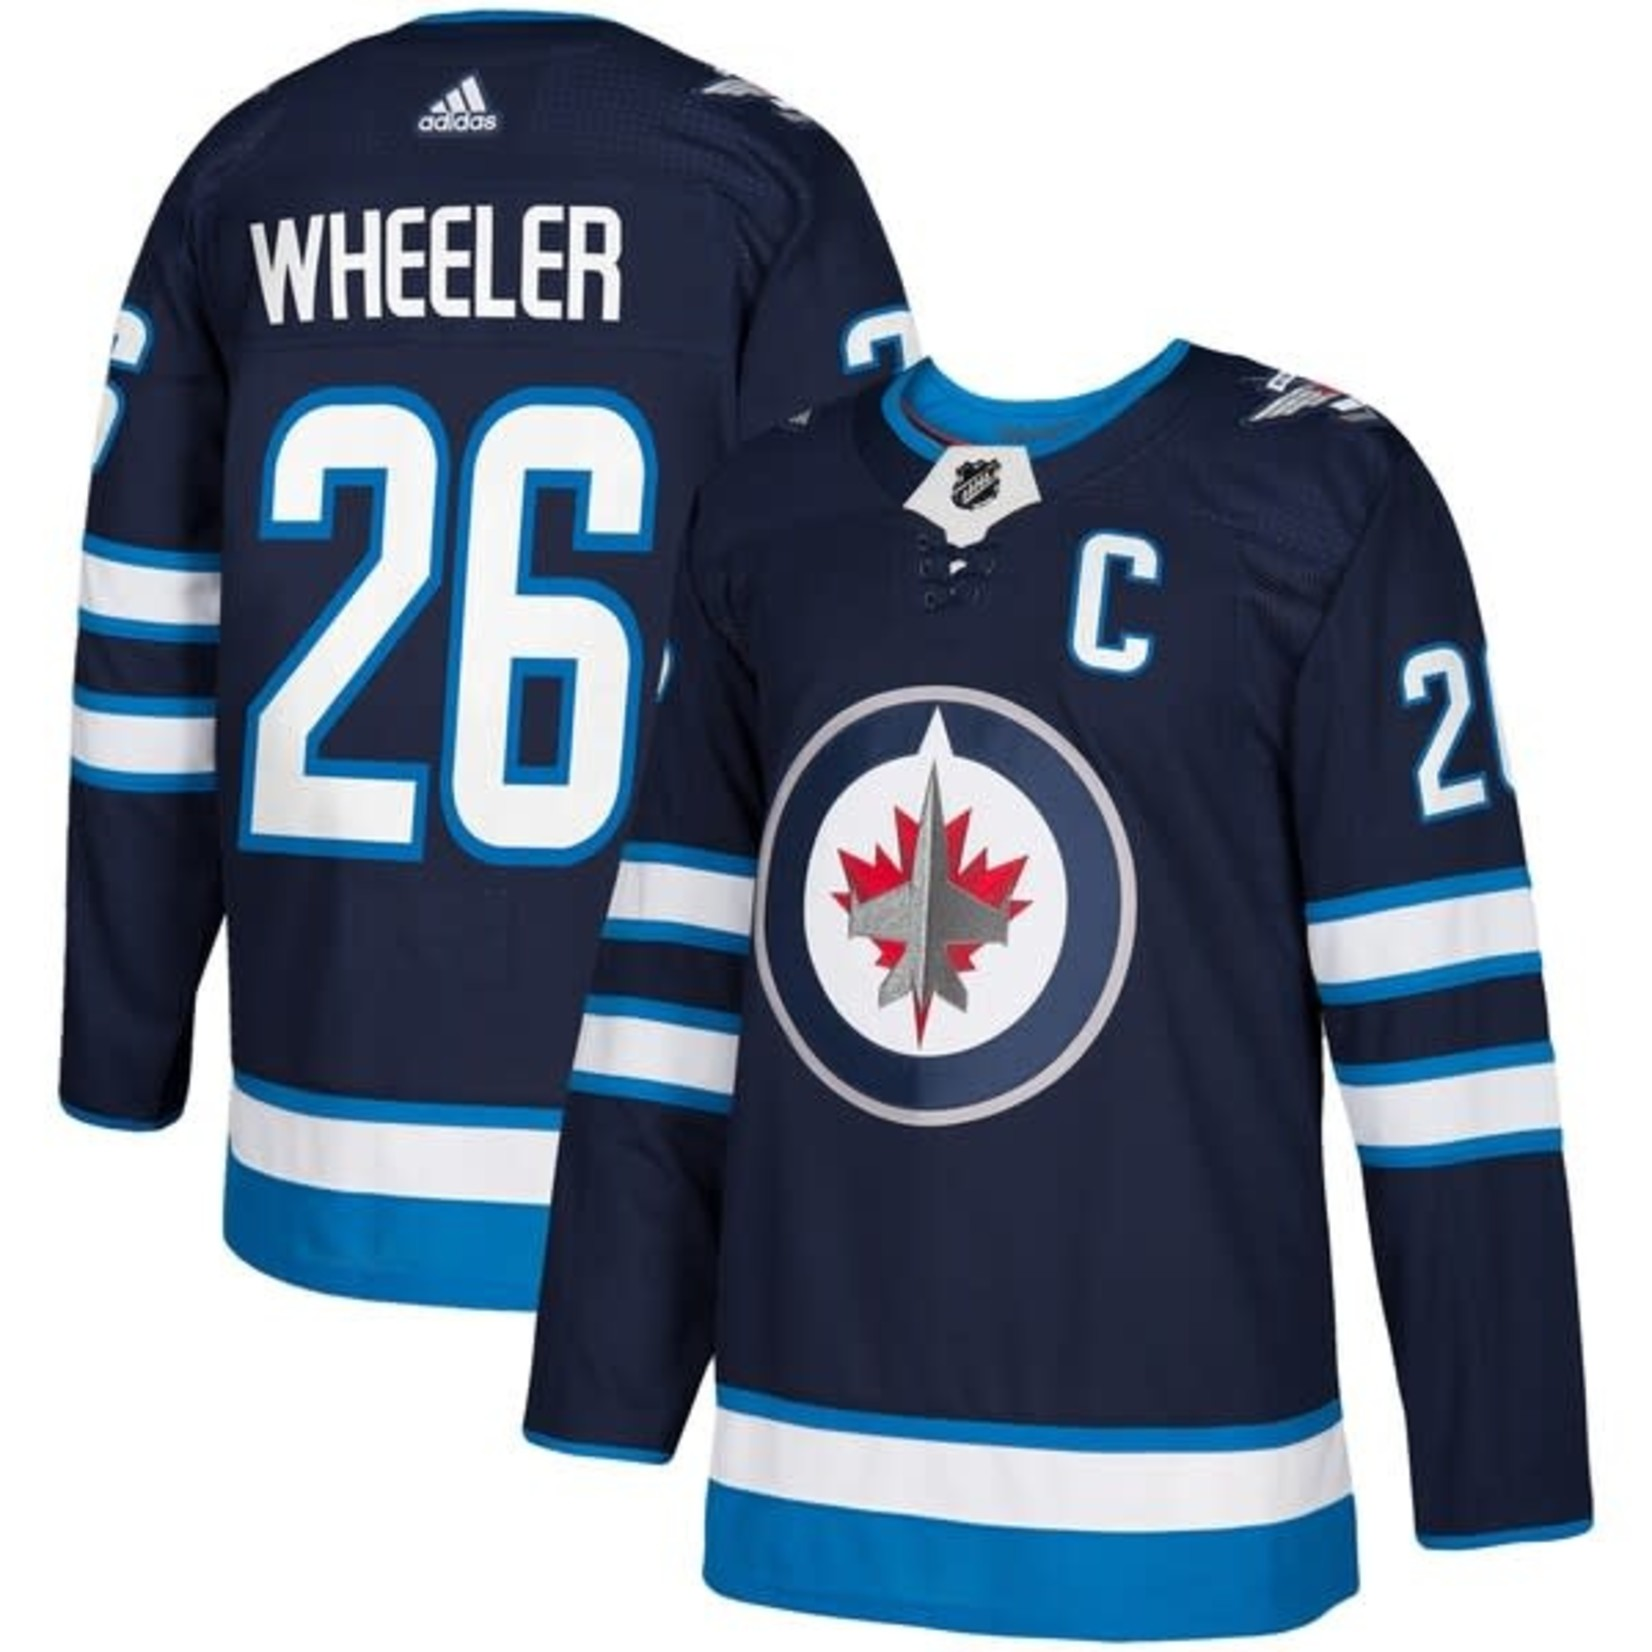 Adidas Adidas Hockey Jersey, Authentic, Mens, NHL, Winnipeg Jets, Home, Blake Wheeler